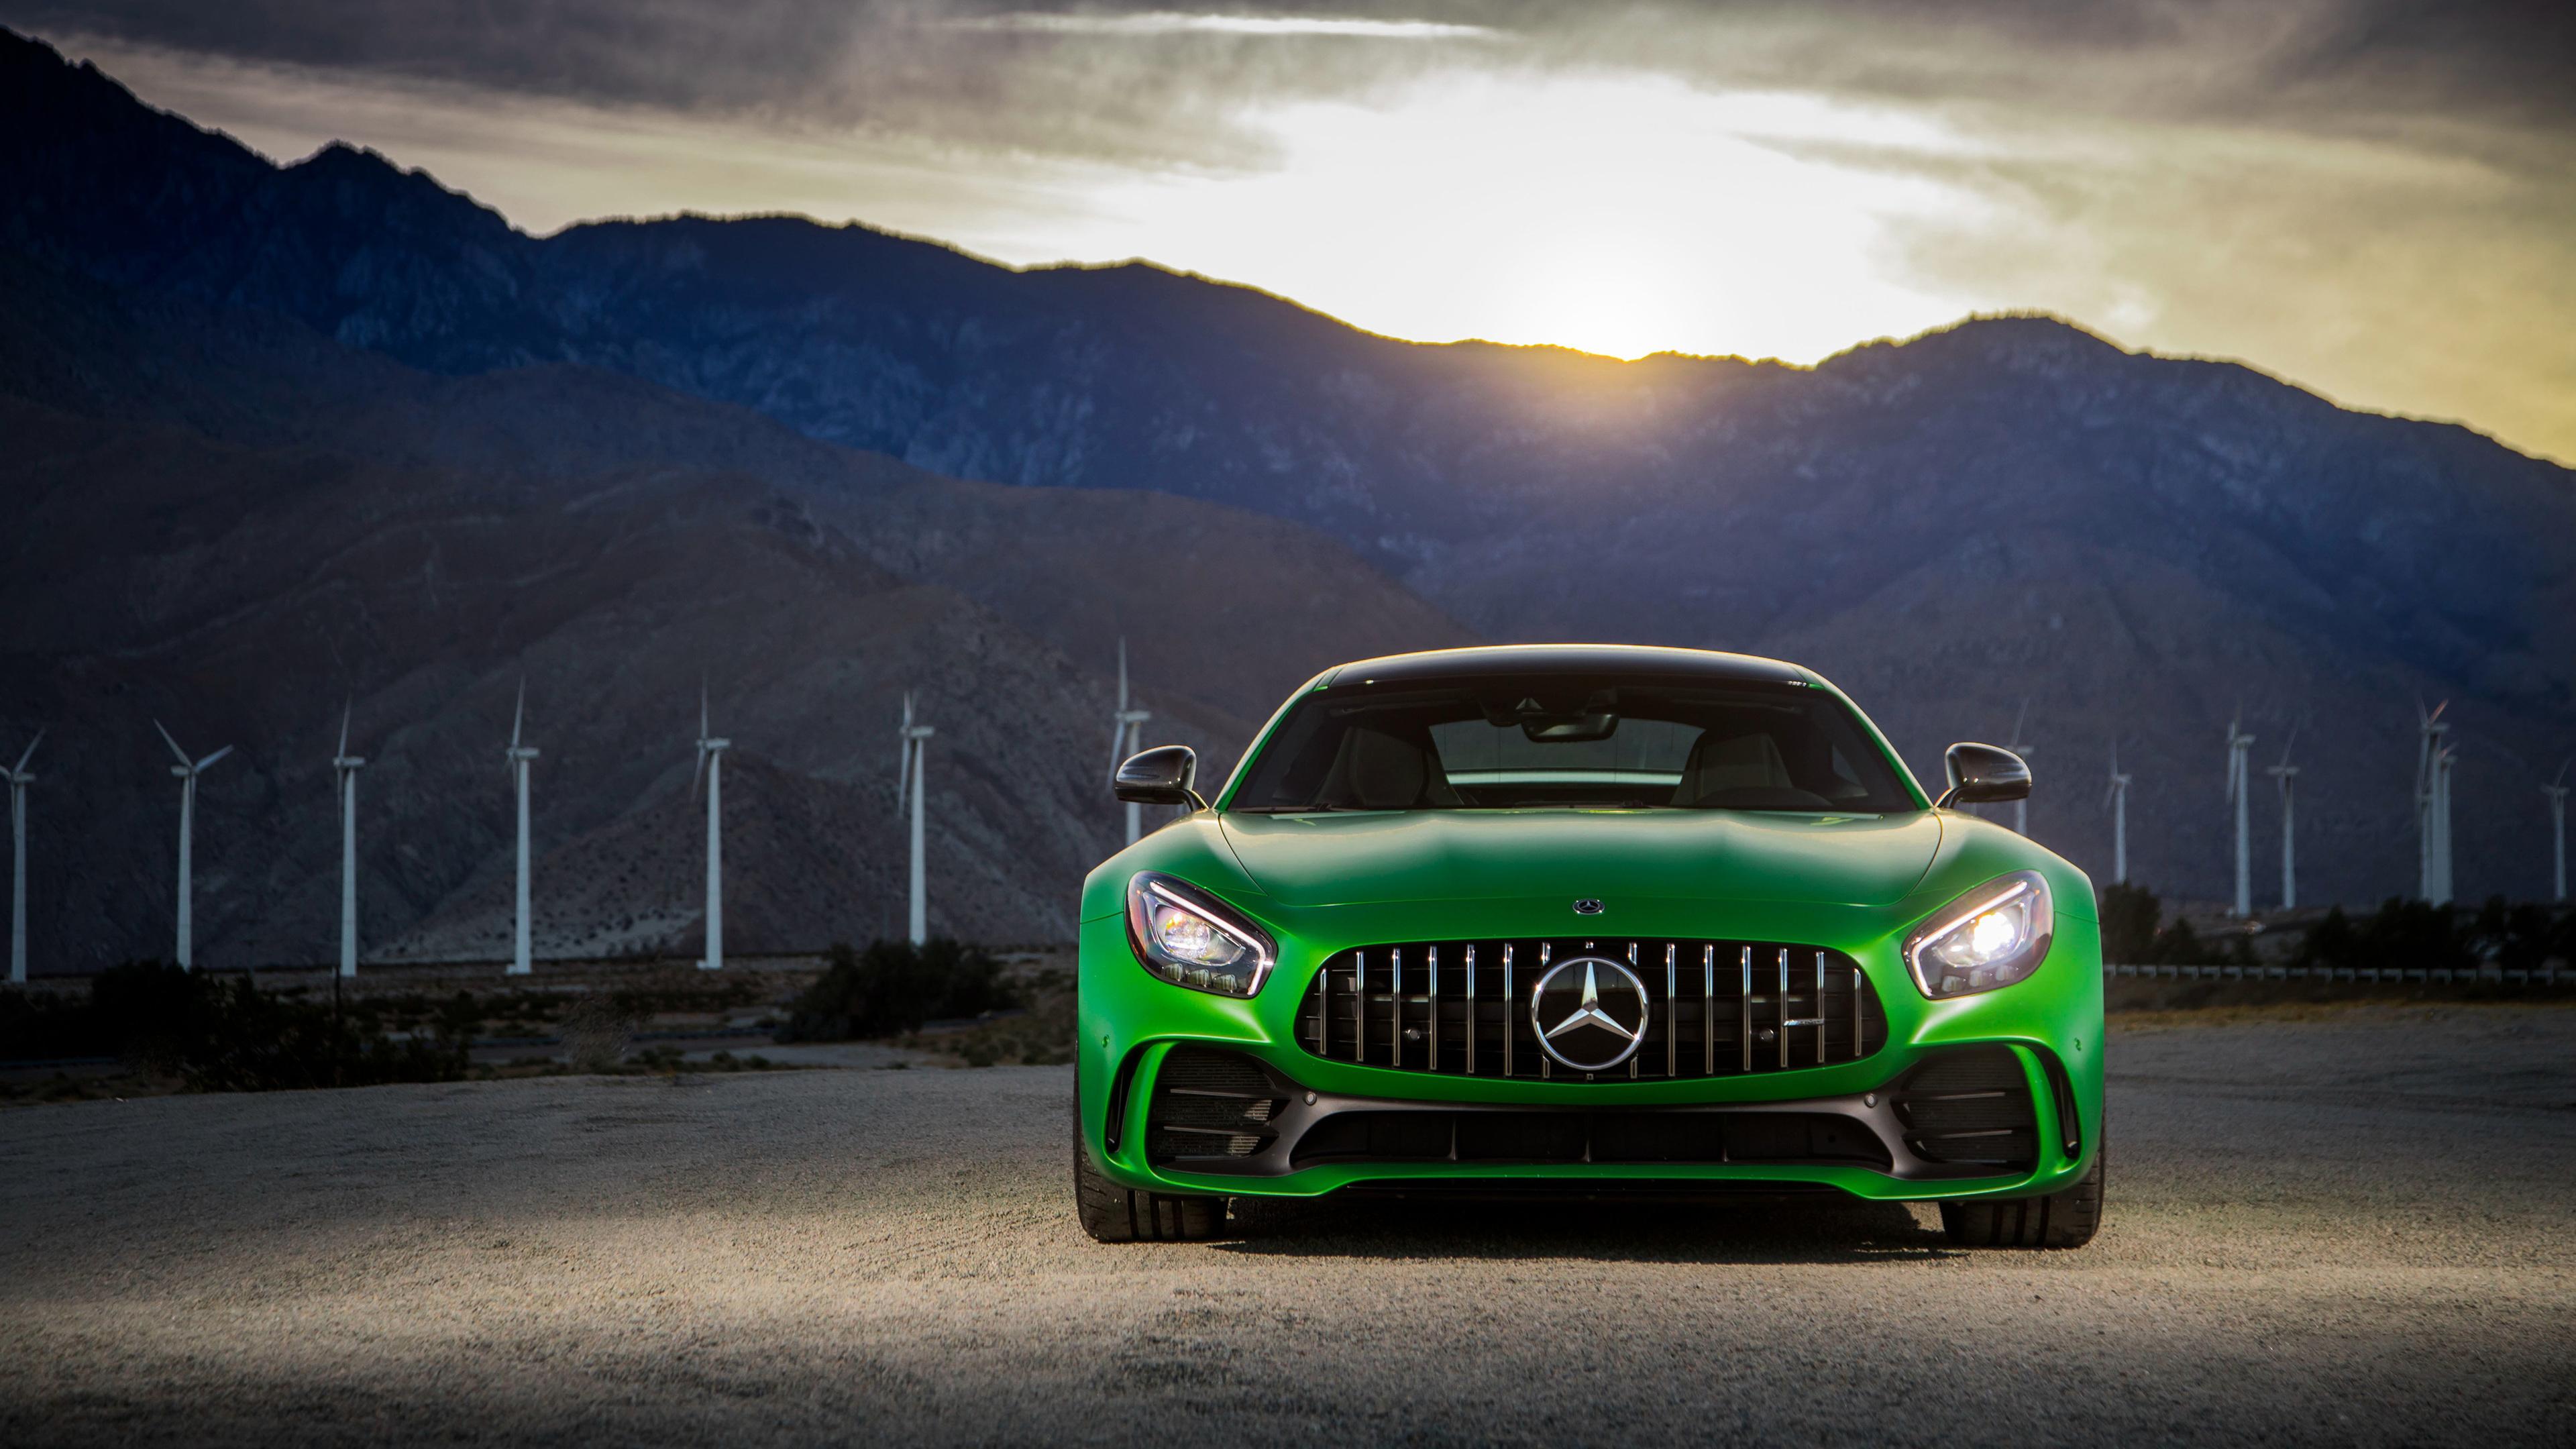 mercedes amg gt r 2018 1539108945 - Mercedes AMG GT R 2018 - mercedes wallpapers, mercedes amg gtr wallpapers, hd-wallpapers, cars wallpapers, 4k-wallpapers, 2018 cars wallpapers